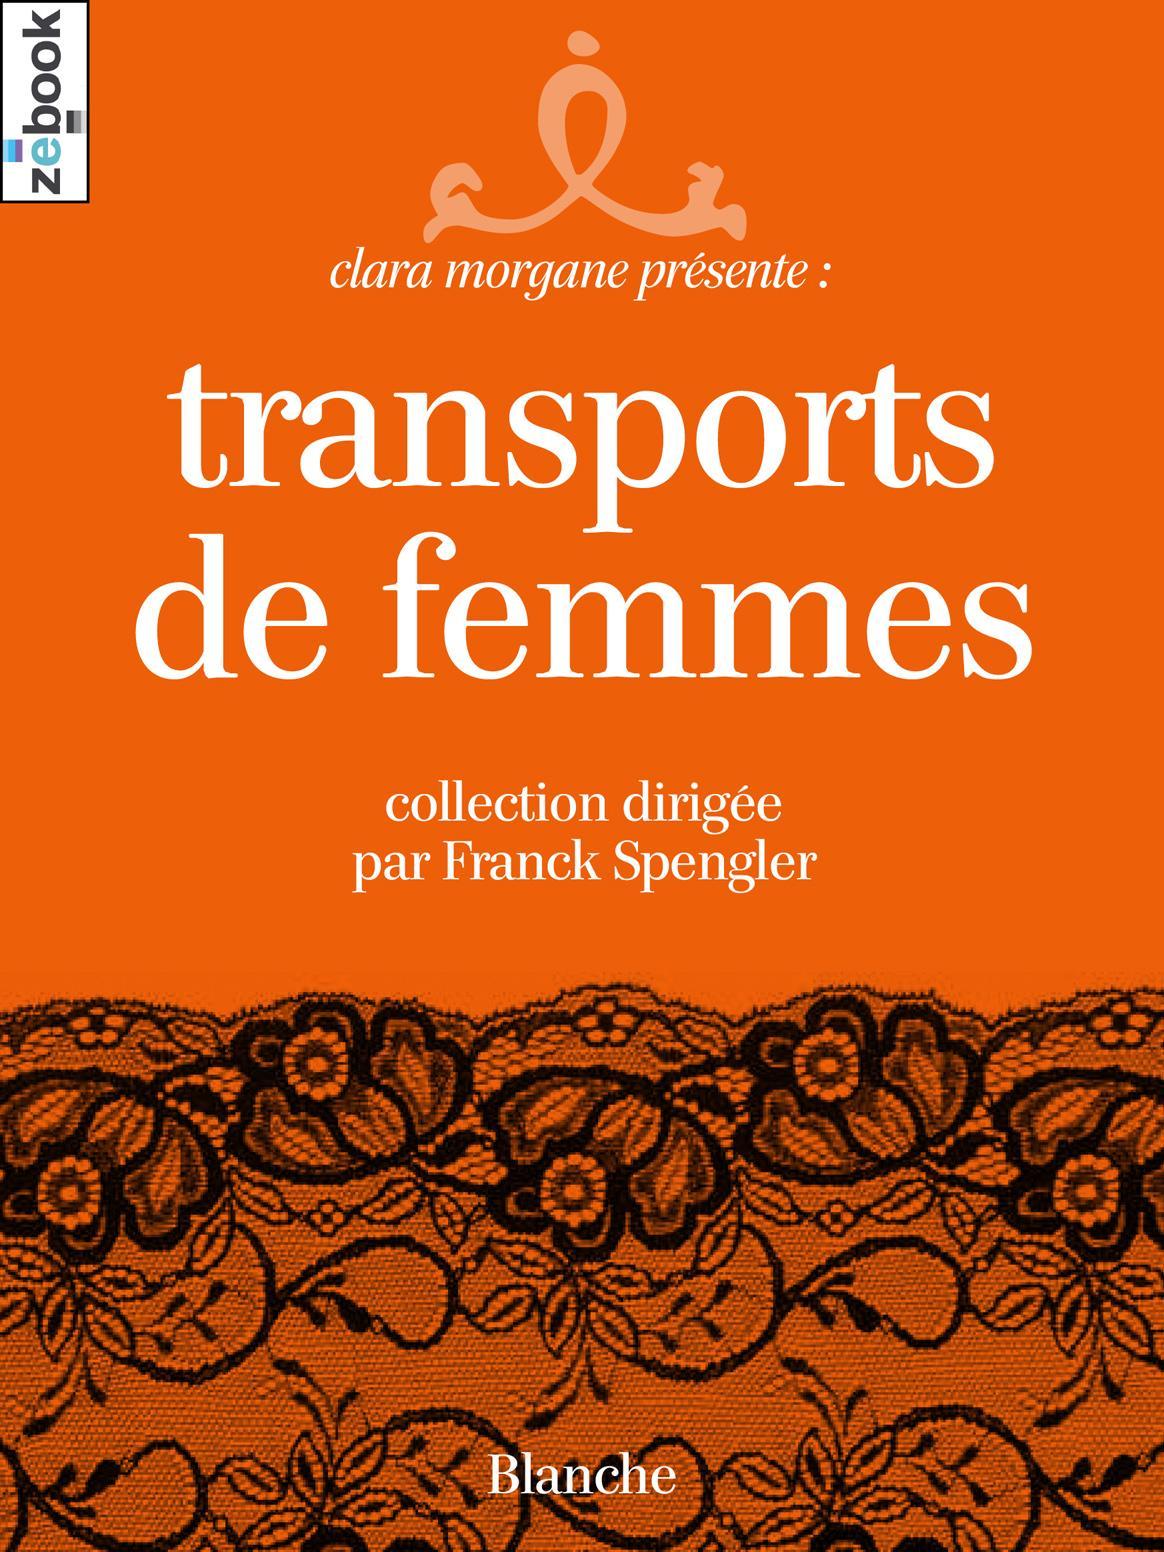 Transports de femmes